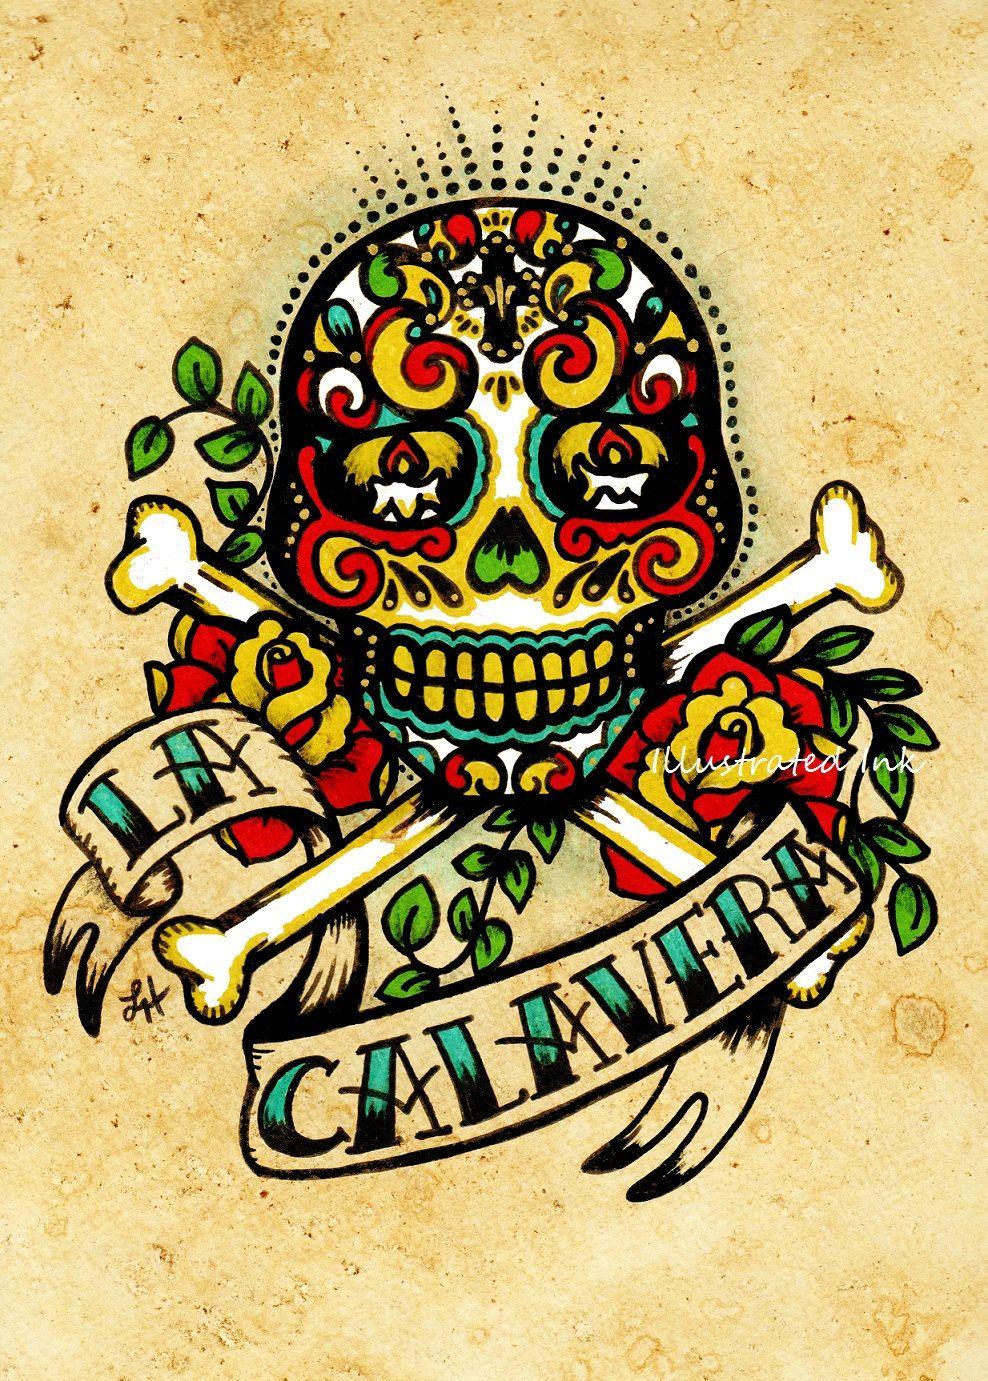 Day of the Dead Sugar Skull Tattoo Art LA CALAVERA Loteria   art ...